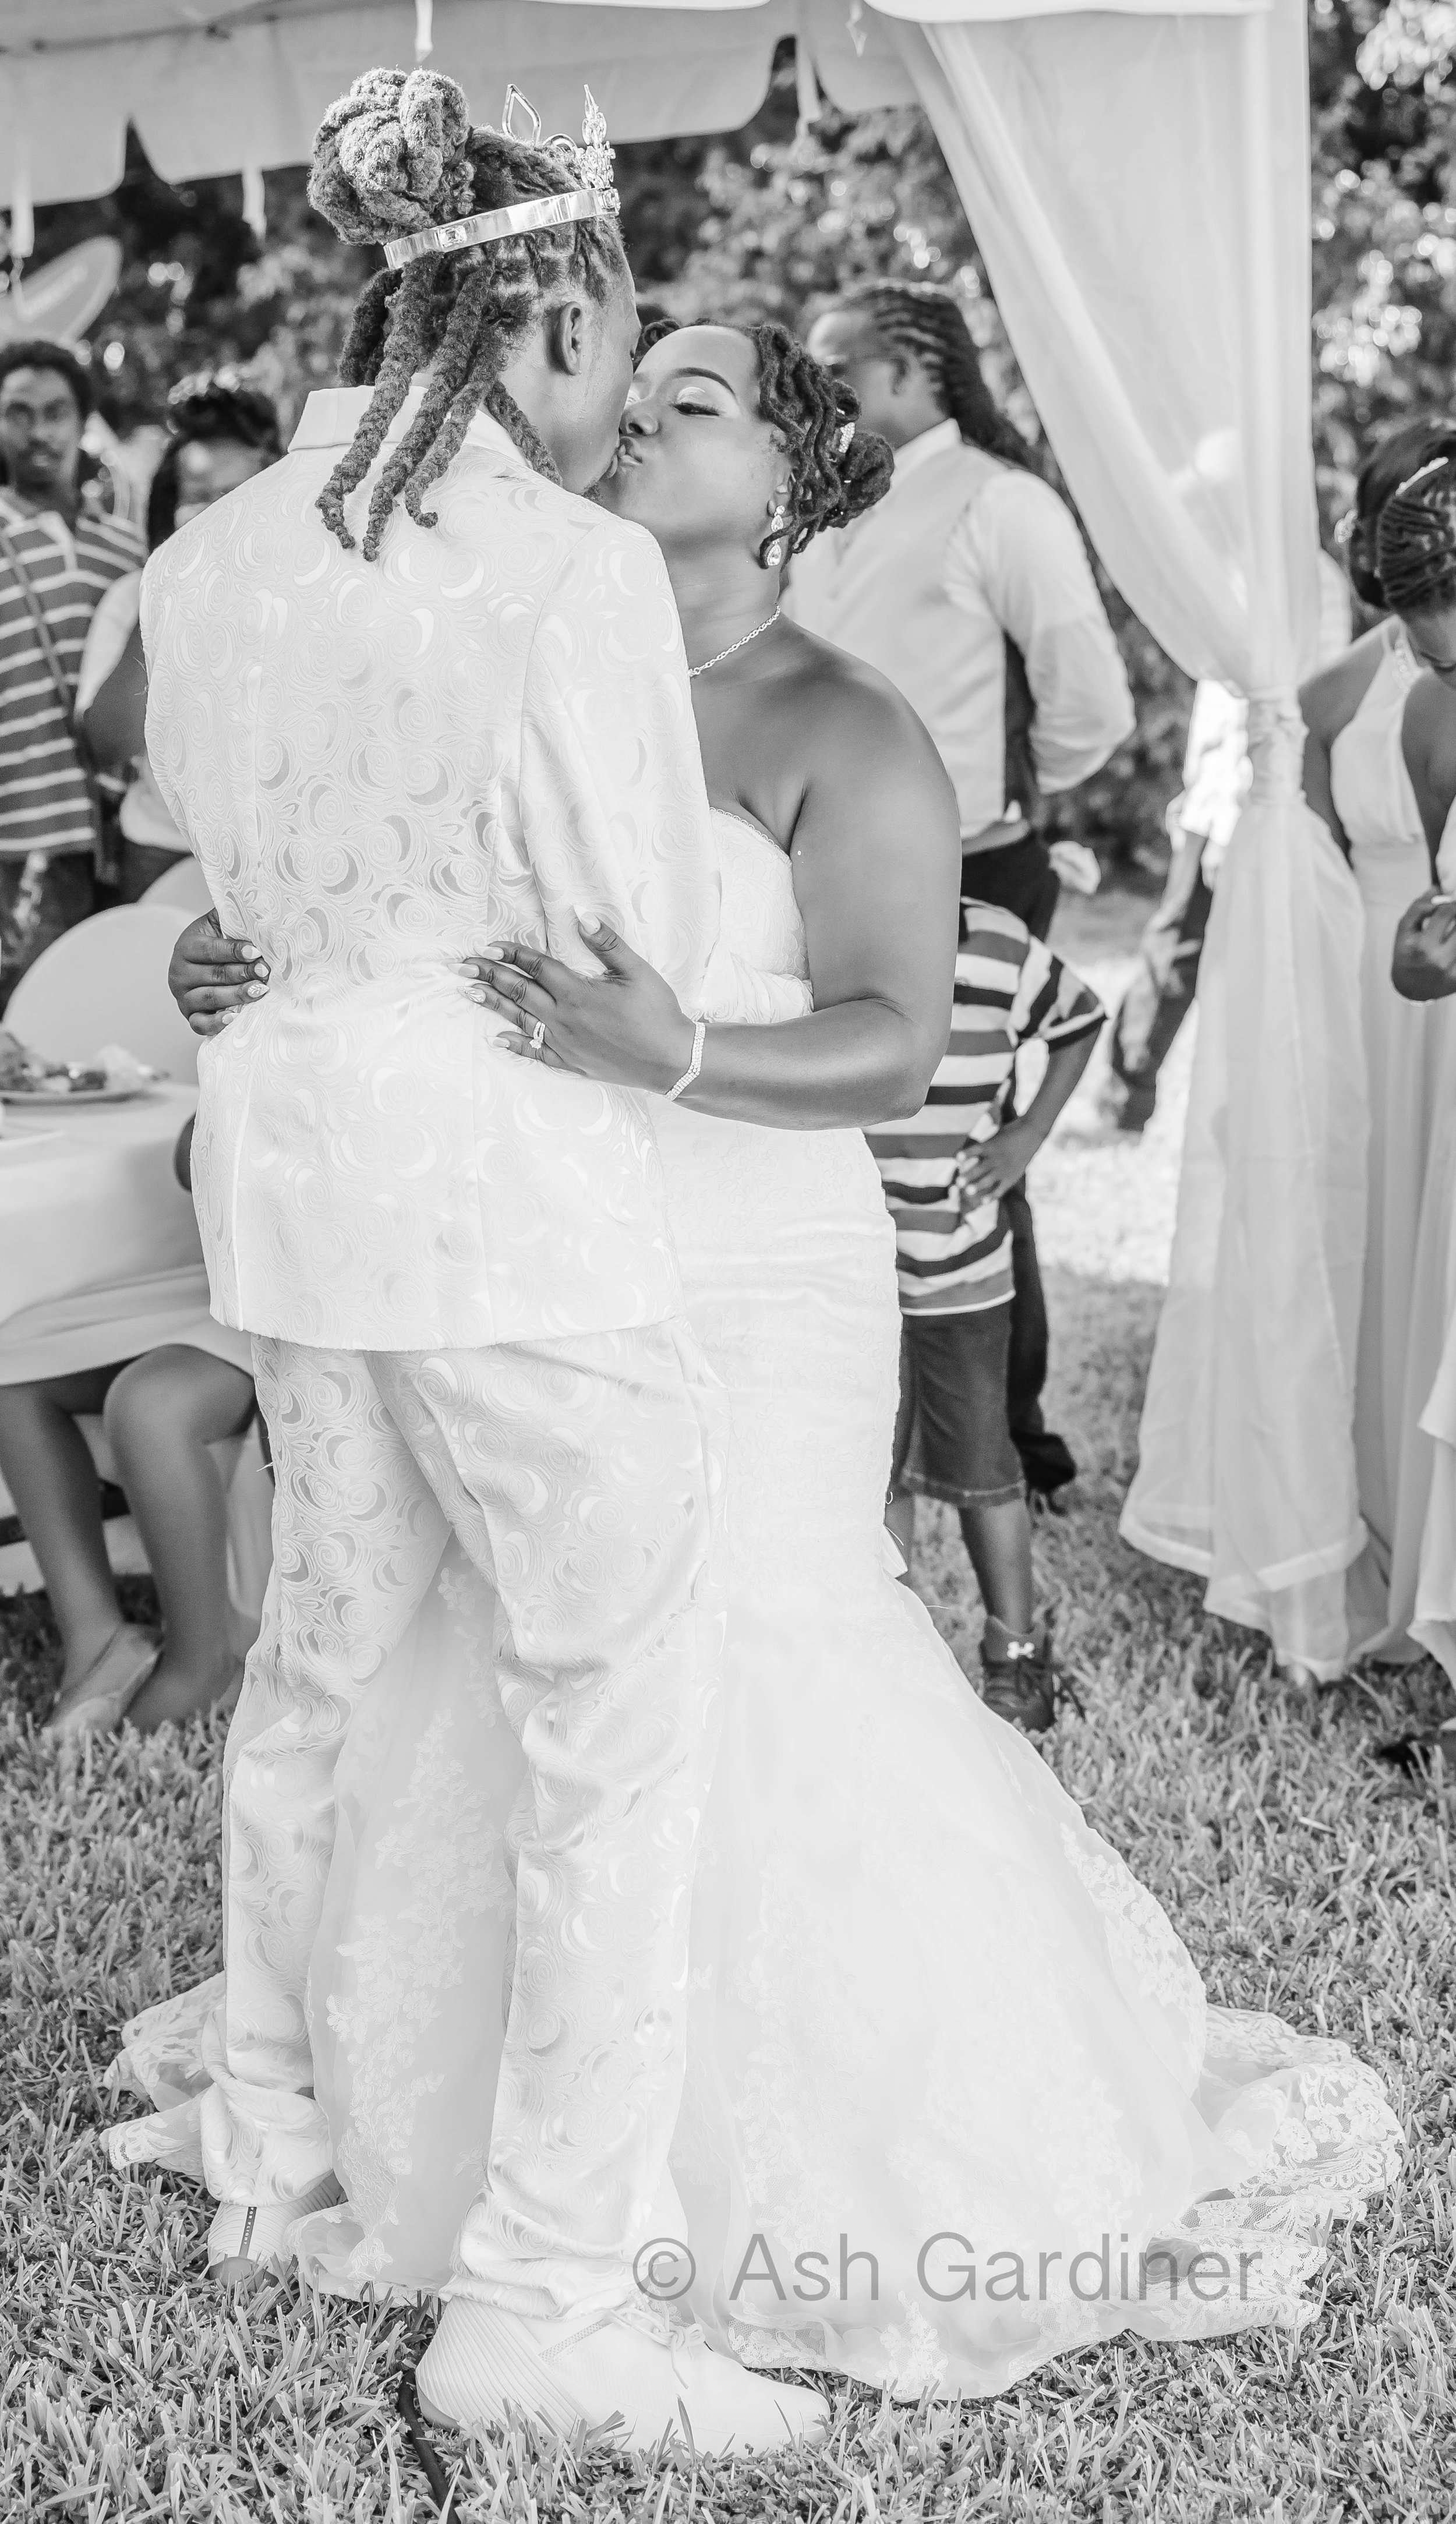 wedding 2 (1 of 1).jpg